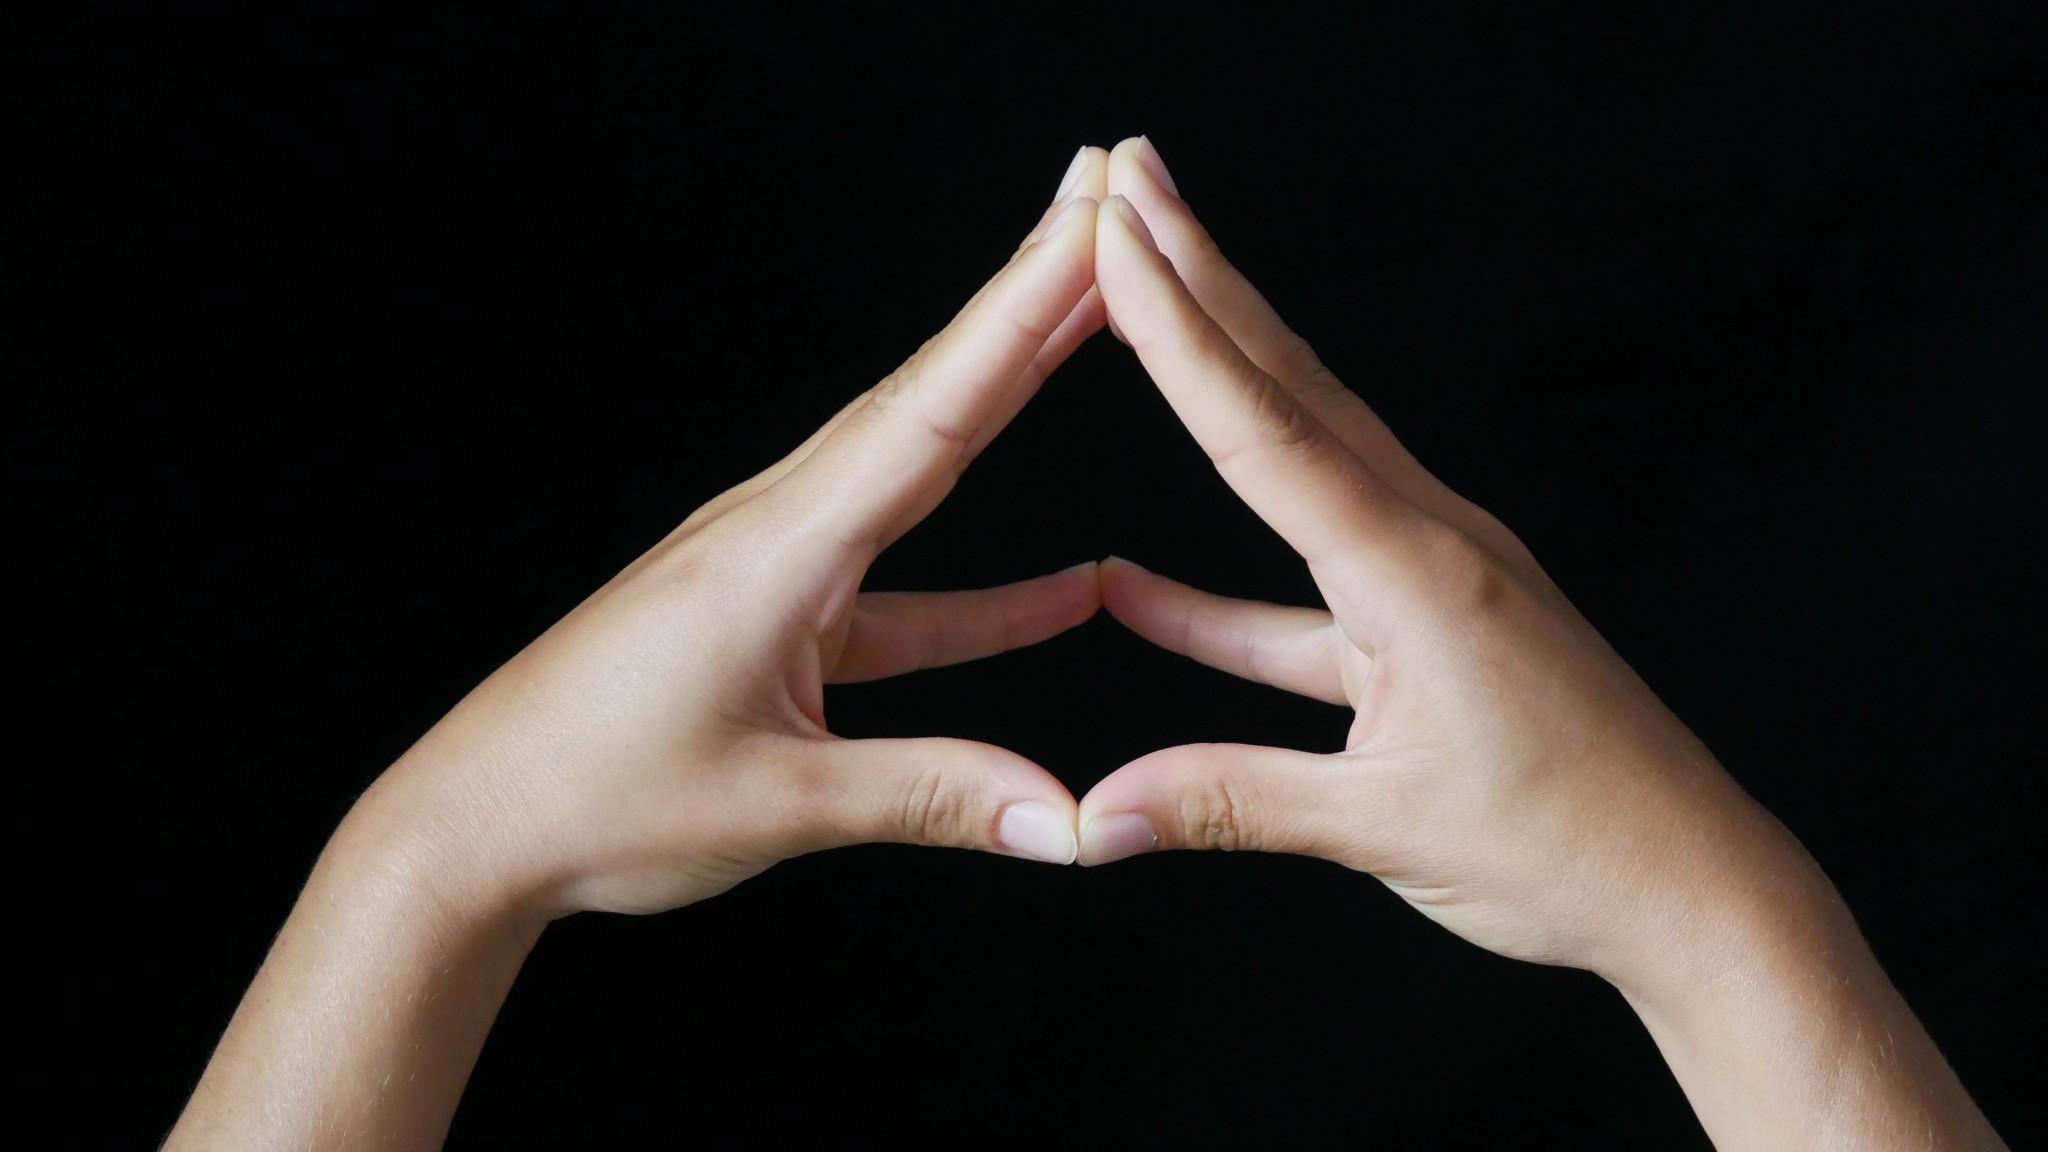 Hände Falten Bedeutung